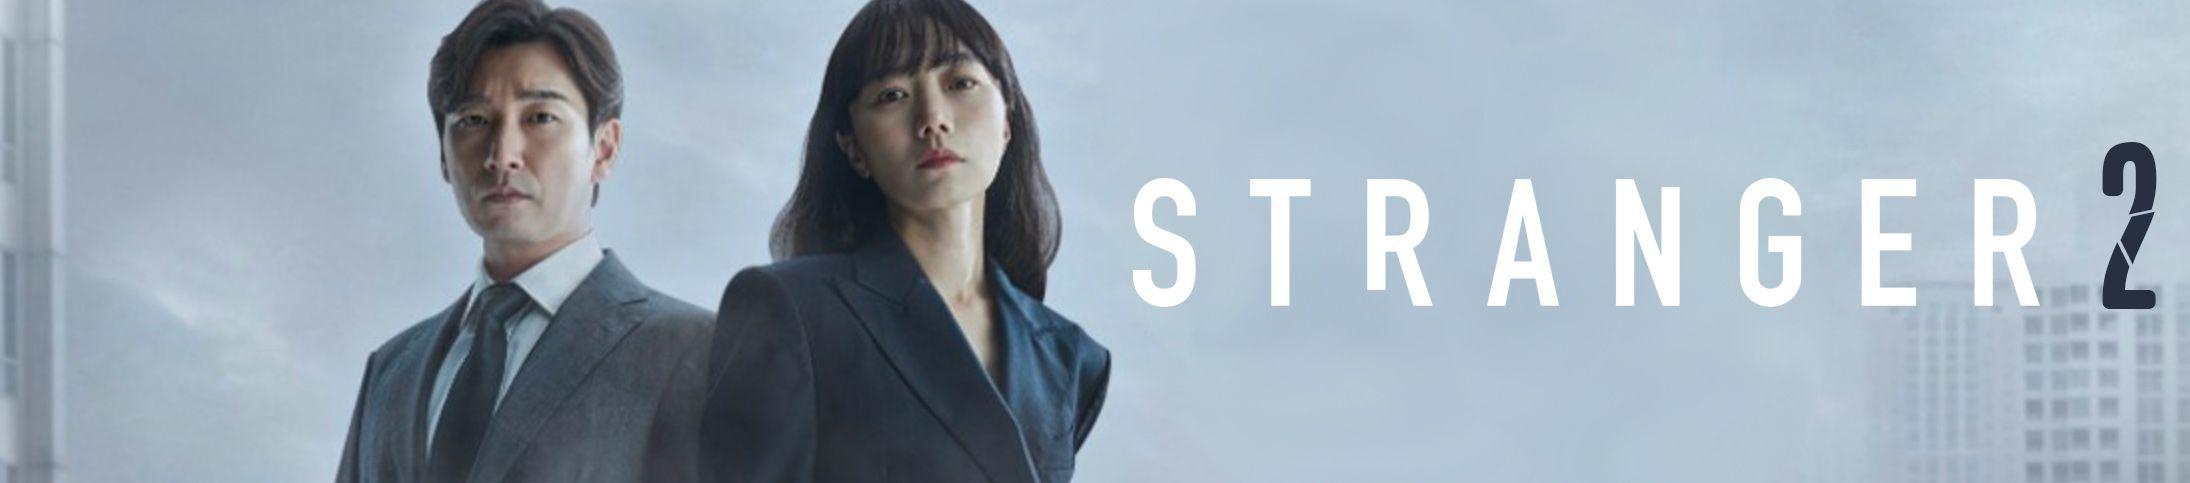 Dossier drama - Stranger - saison 2